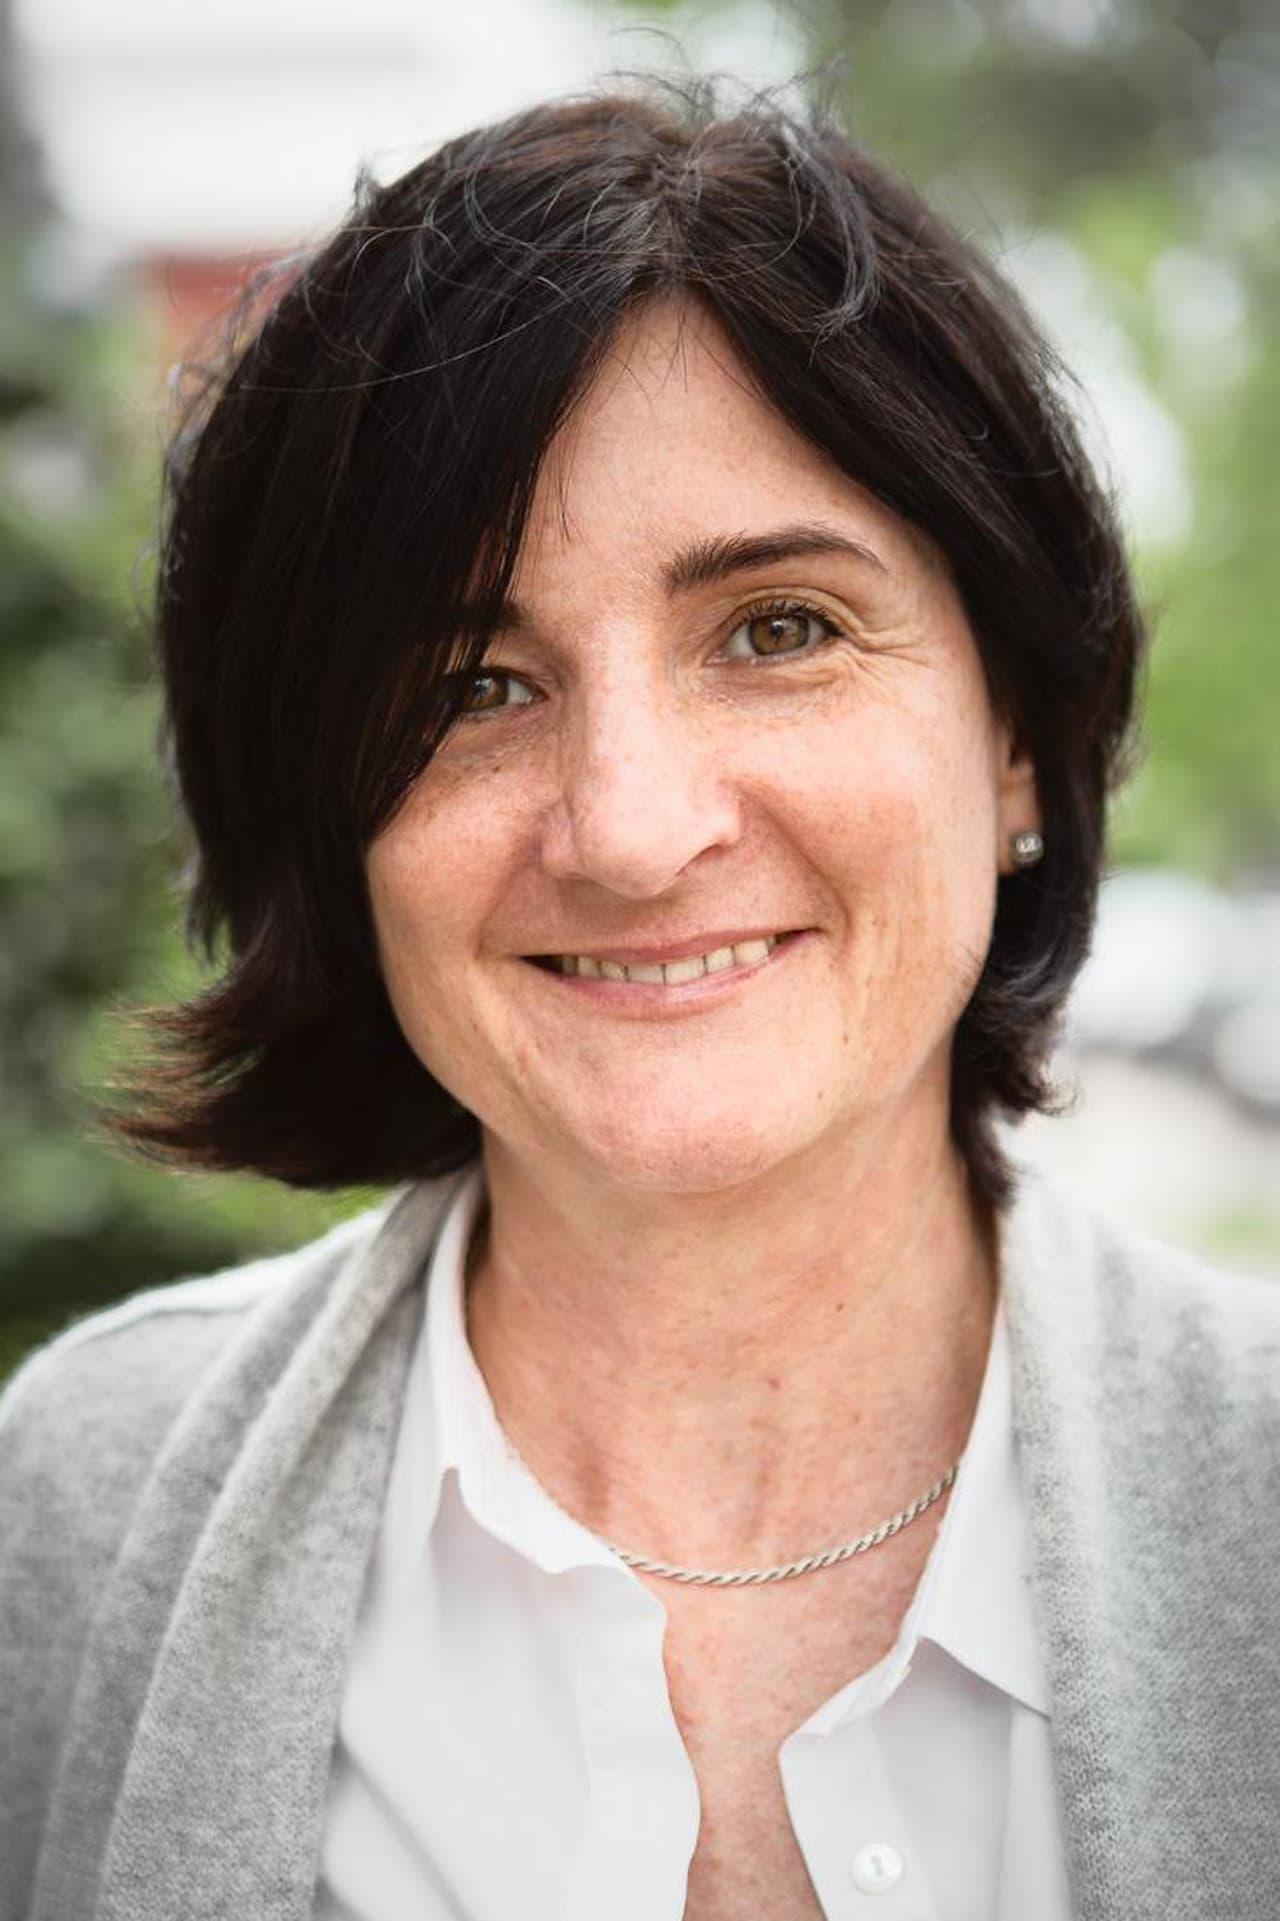 Sophie Deschênes